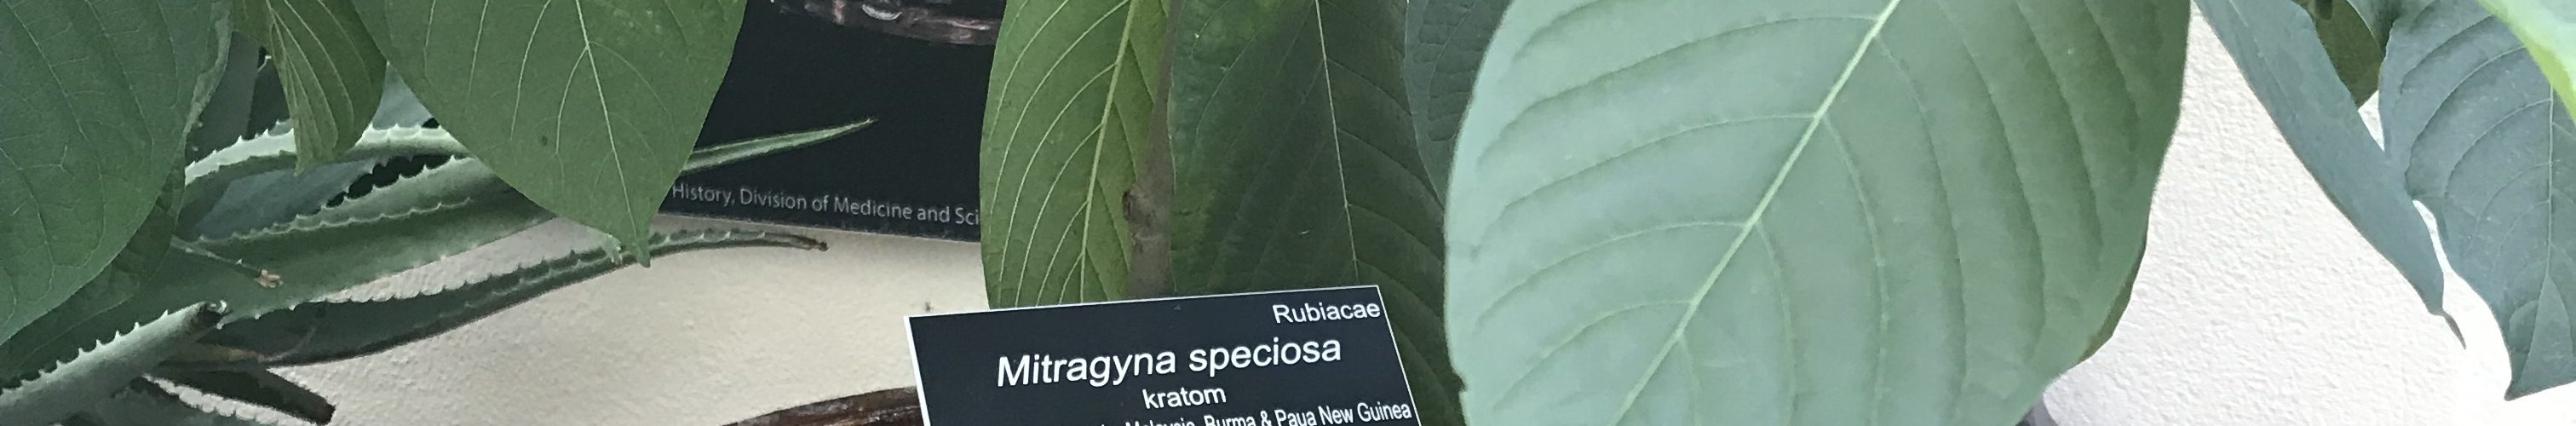 Mitragyna speciosa plant